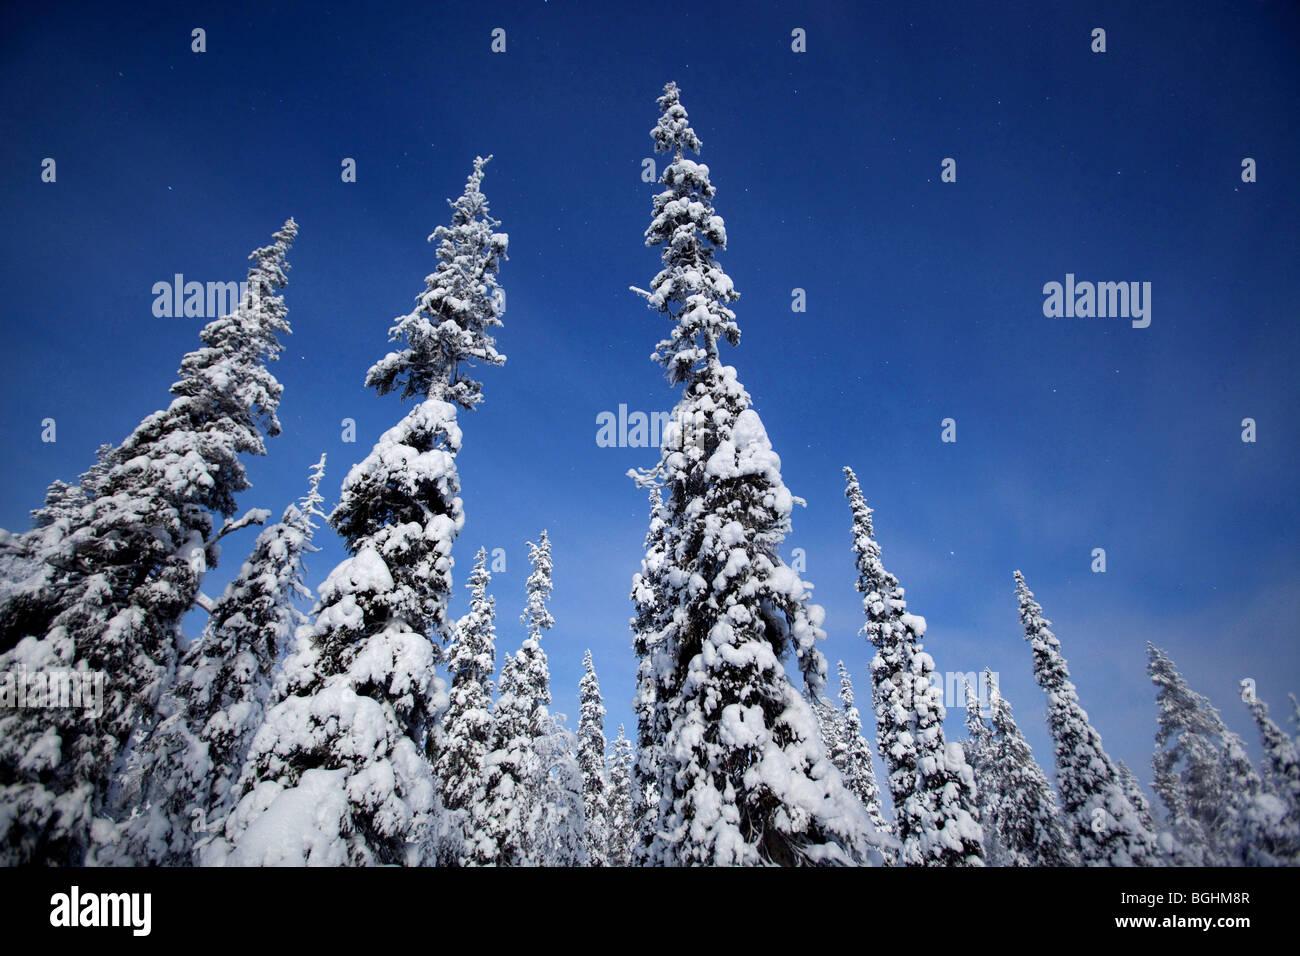 Spruce forest in Urho Kekkonen National Park, Finland - Stock Image